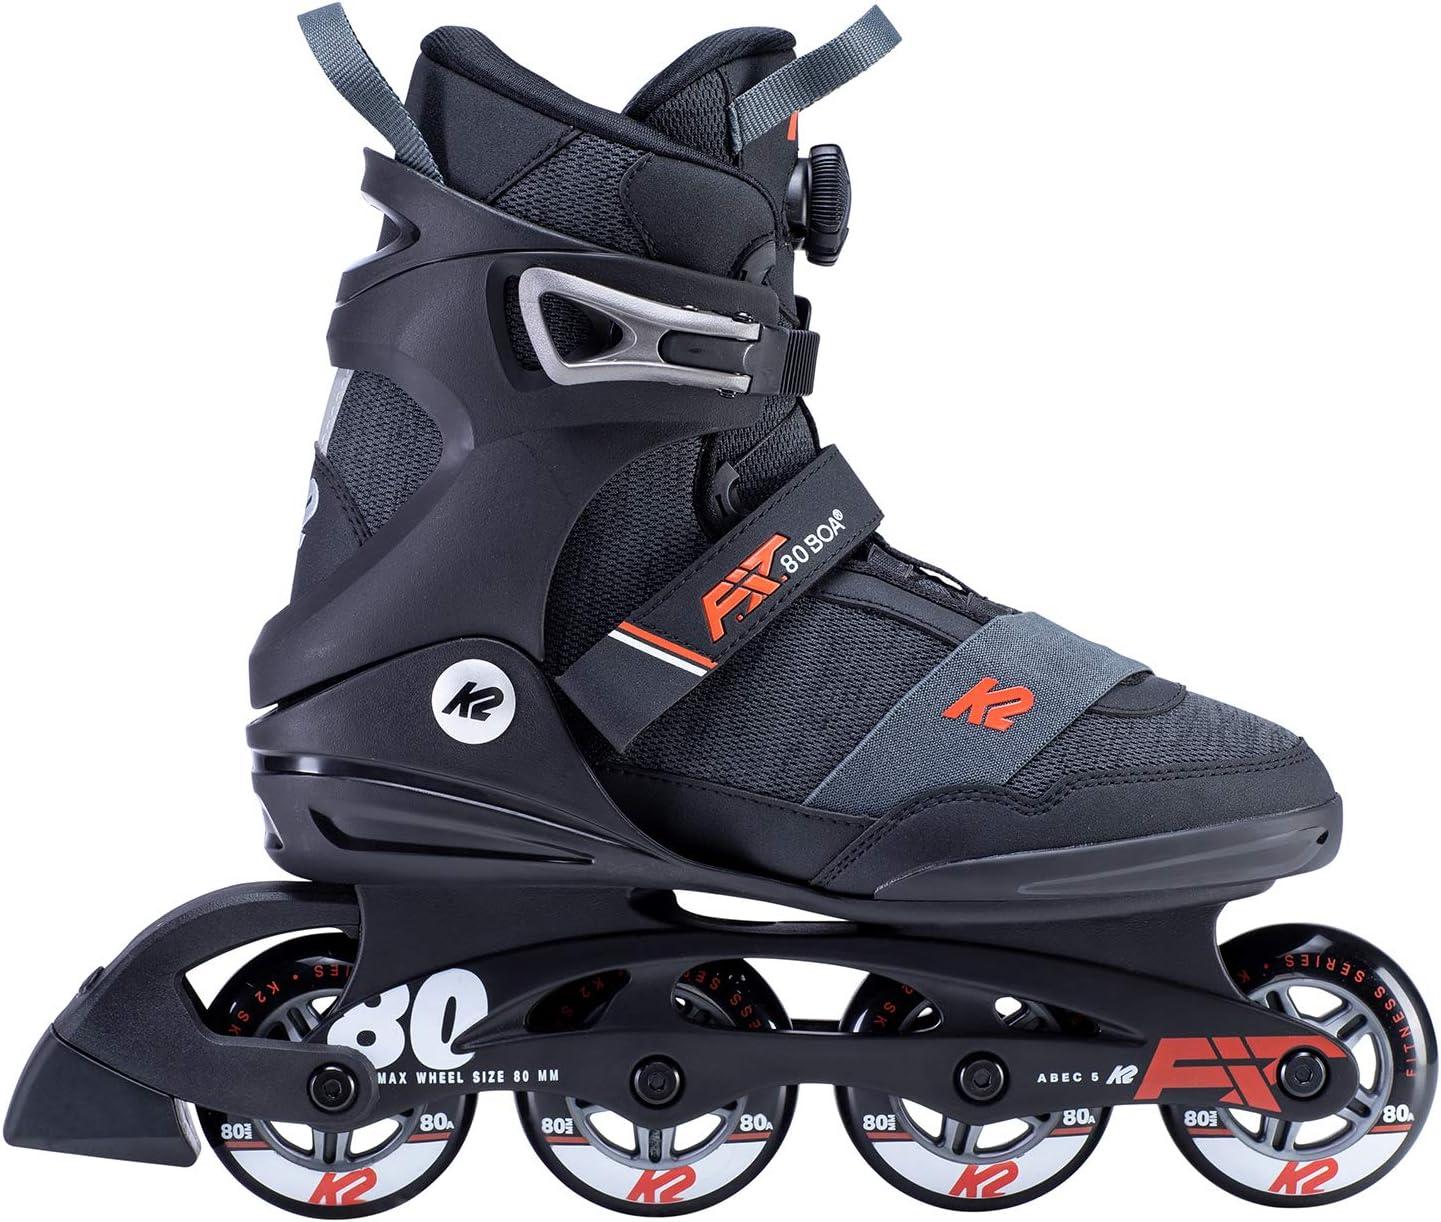 80 Boa Inline Skates K2 F.I.T